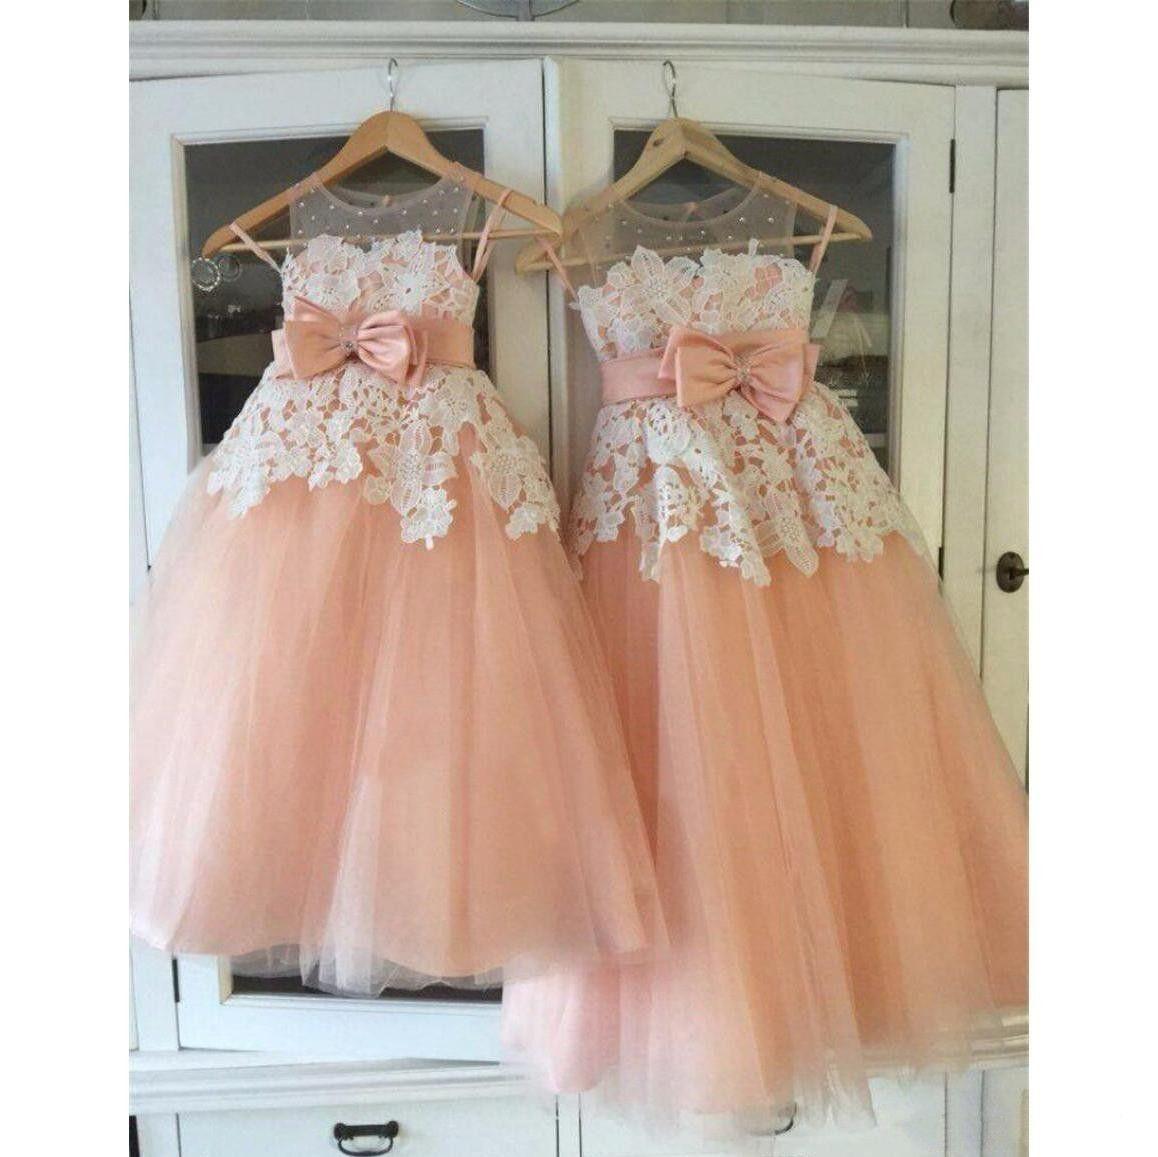 608d1d955 2018 Cute Orange Princess Girls Pageant Dresses Sheer Jewel Neck ...